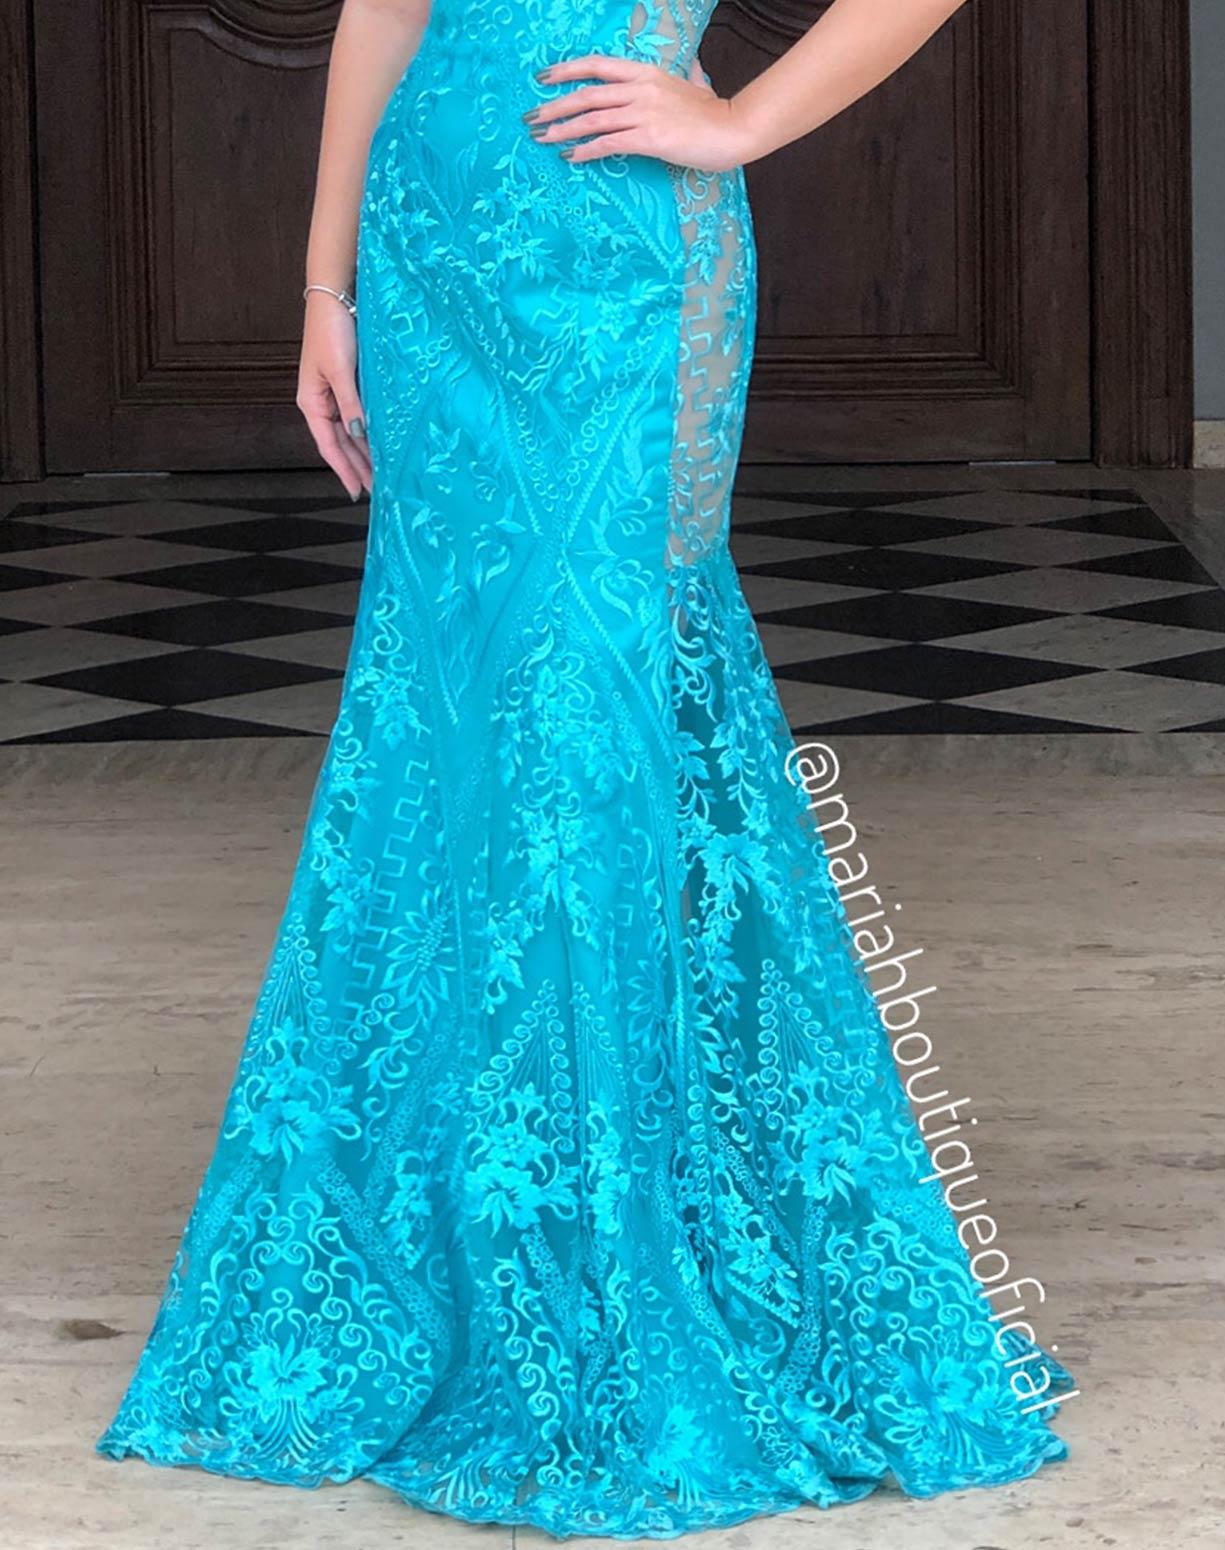 Vestido Tiffany Sereia em Renda